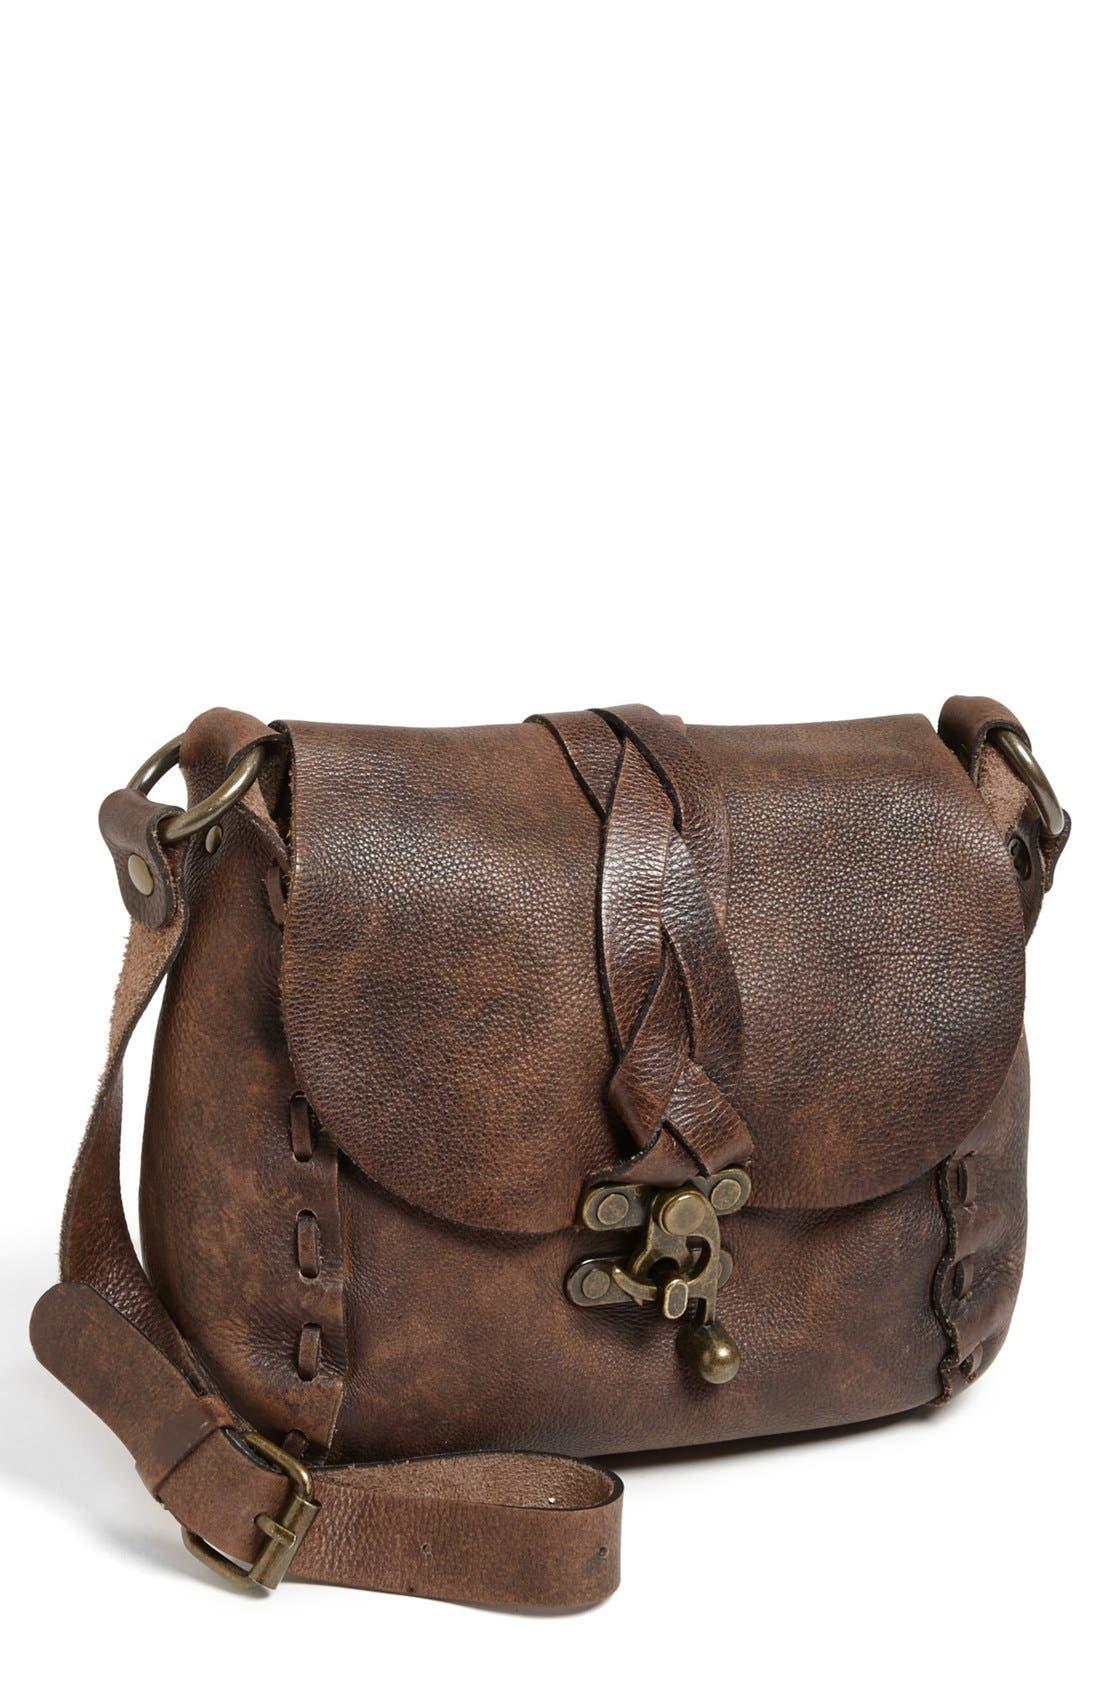 Main Image - Patricia Nash 'Serrone' Shoulder Bag, Small